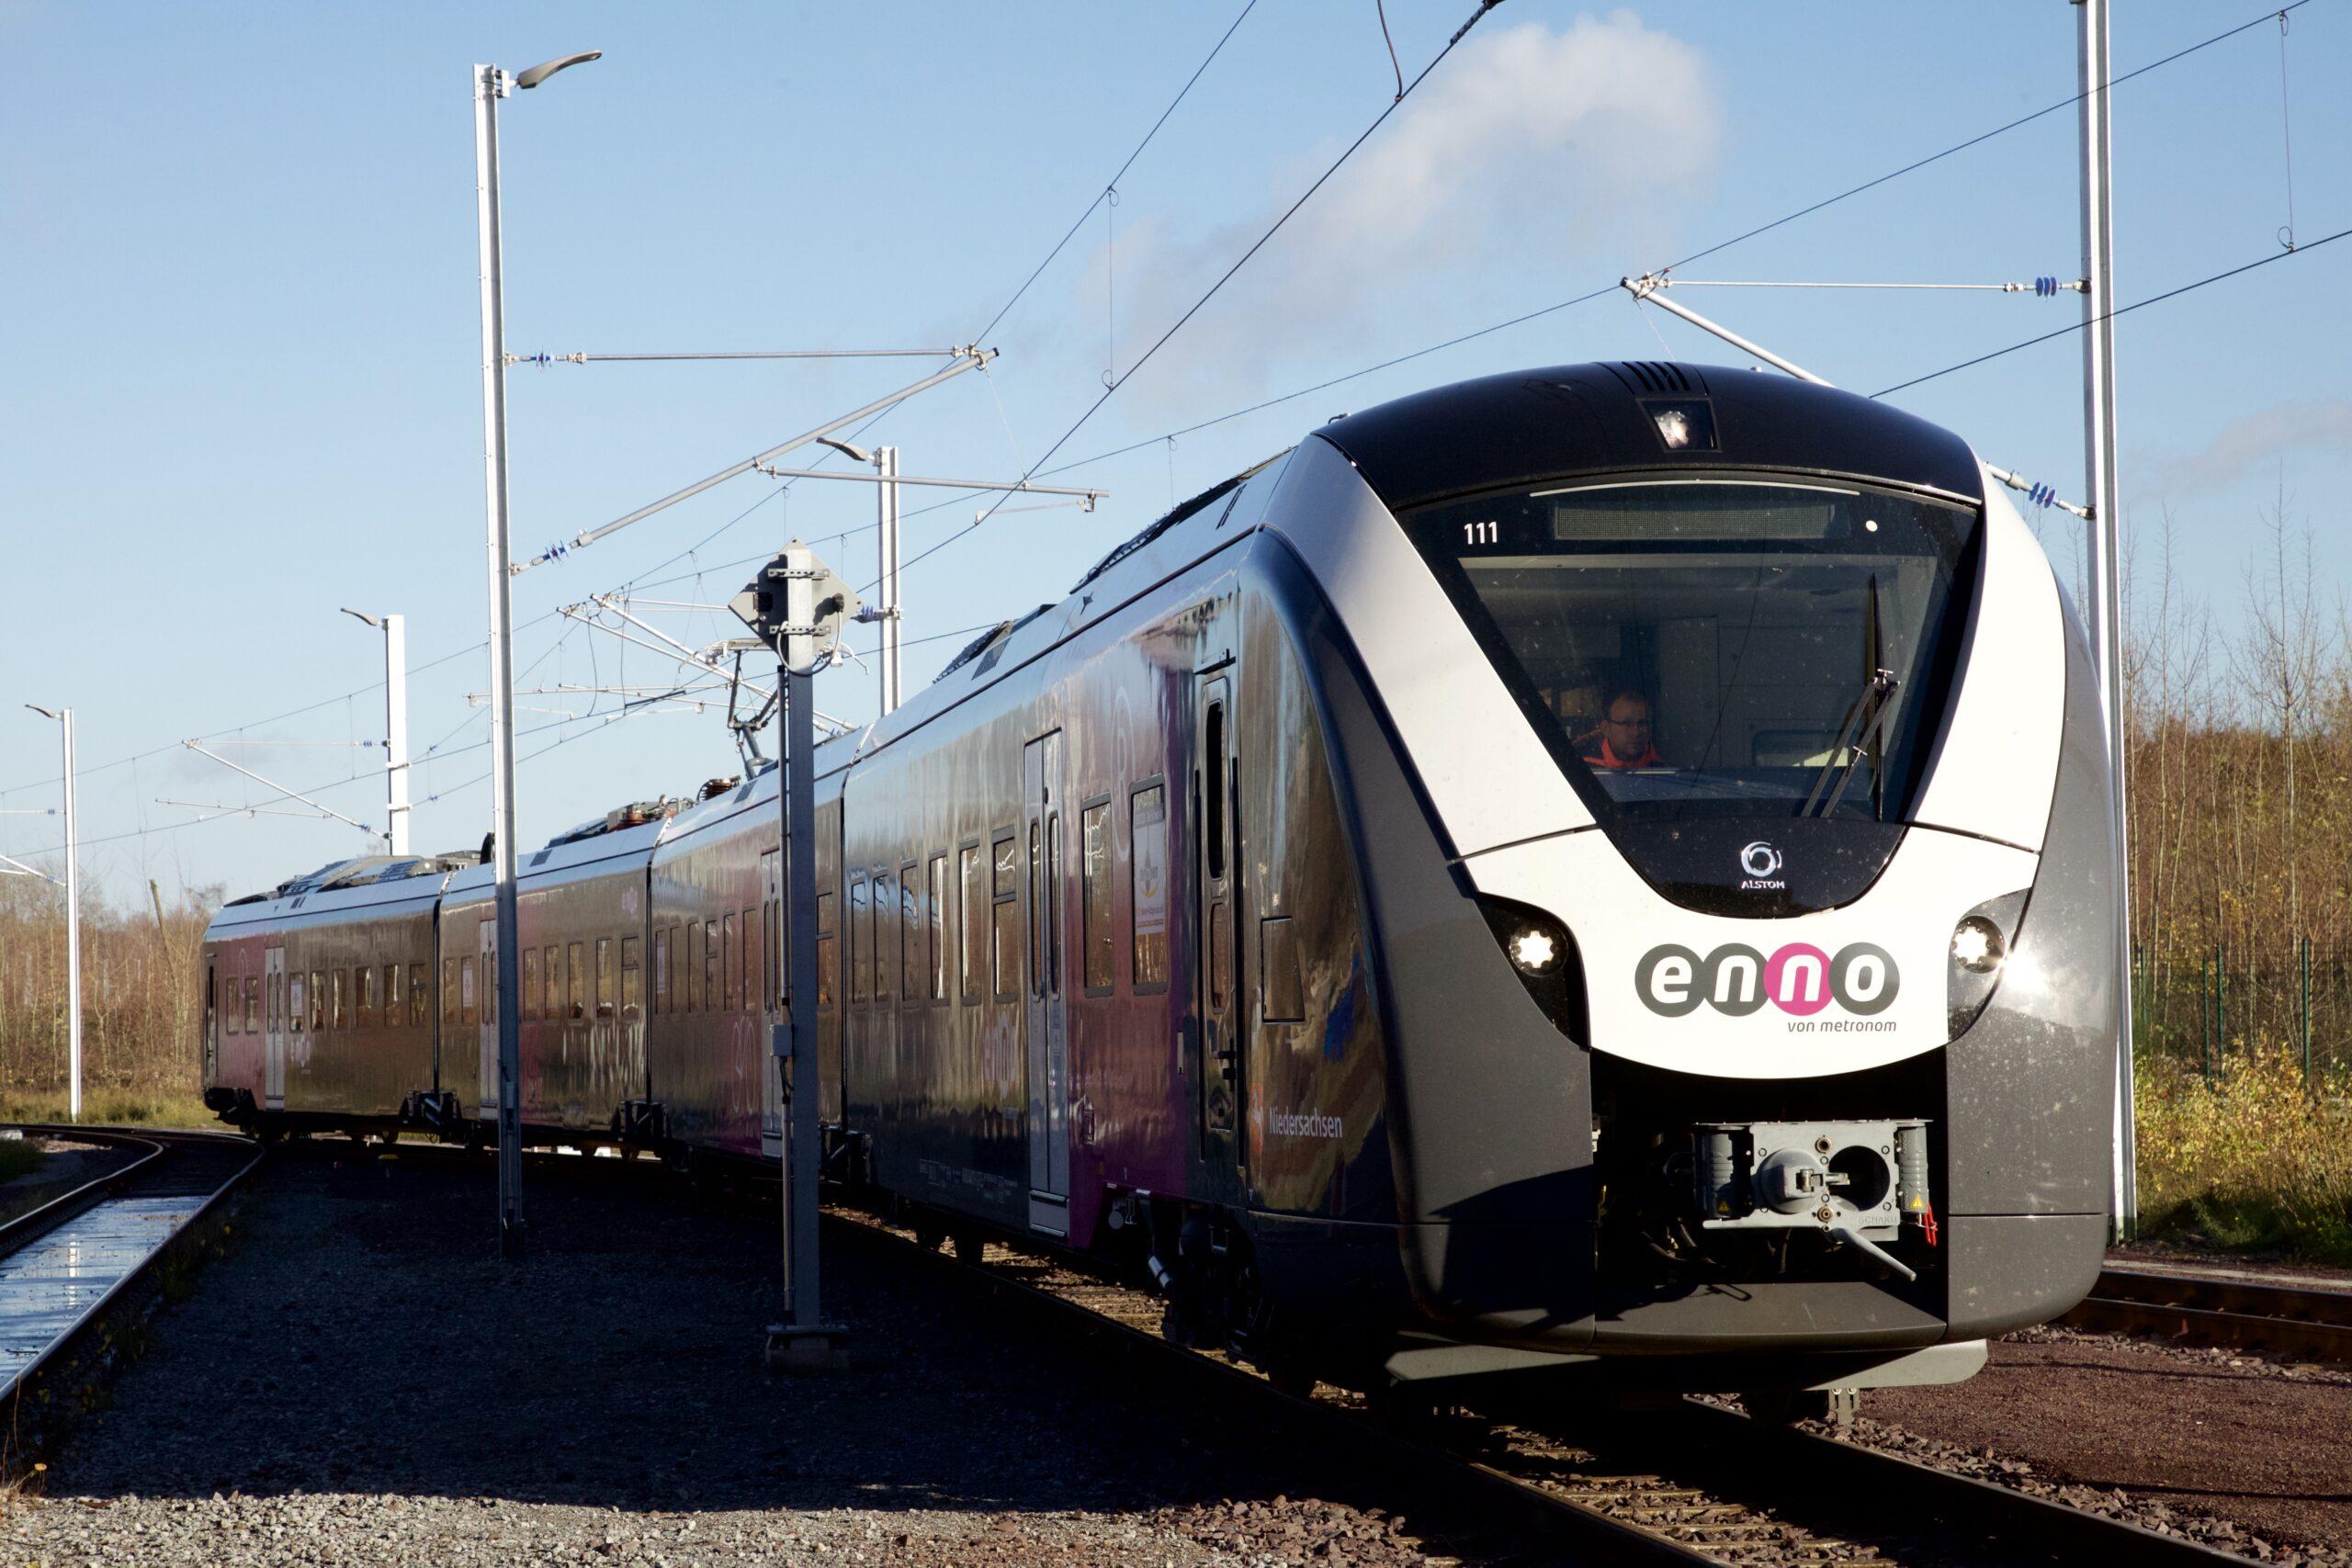 Alstom Coradia Continental 'enno'